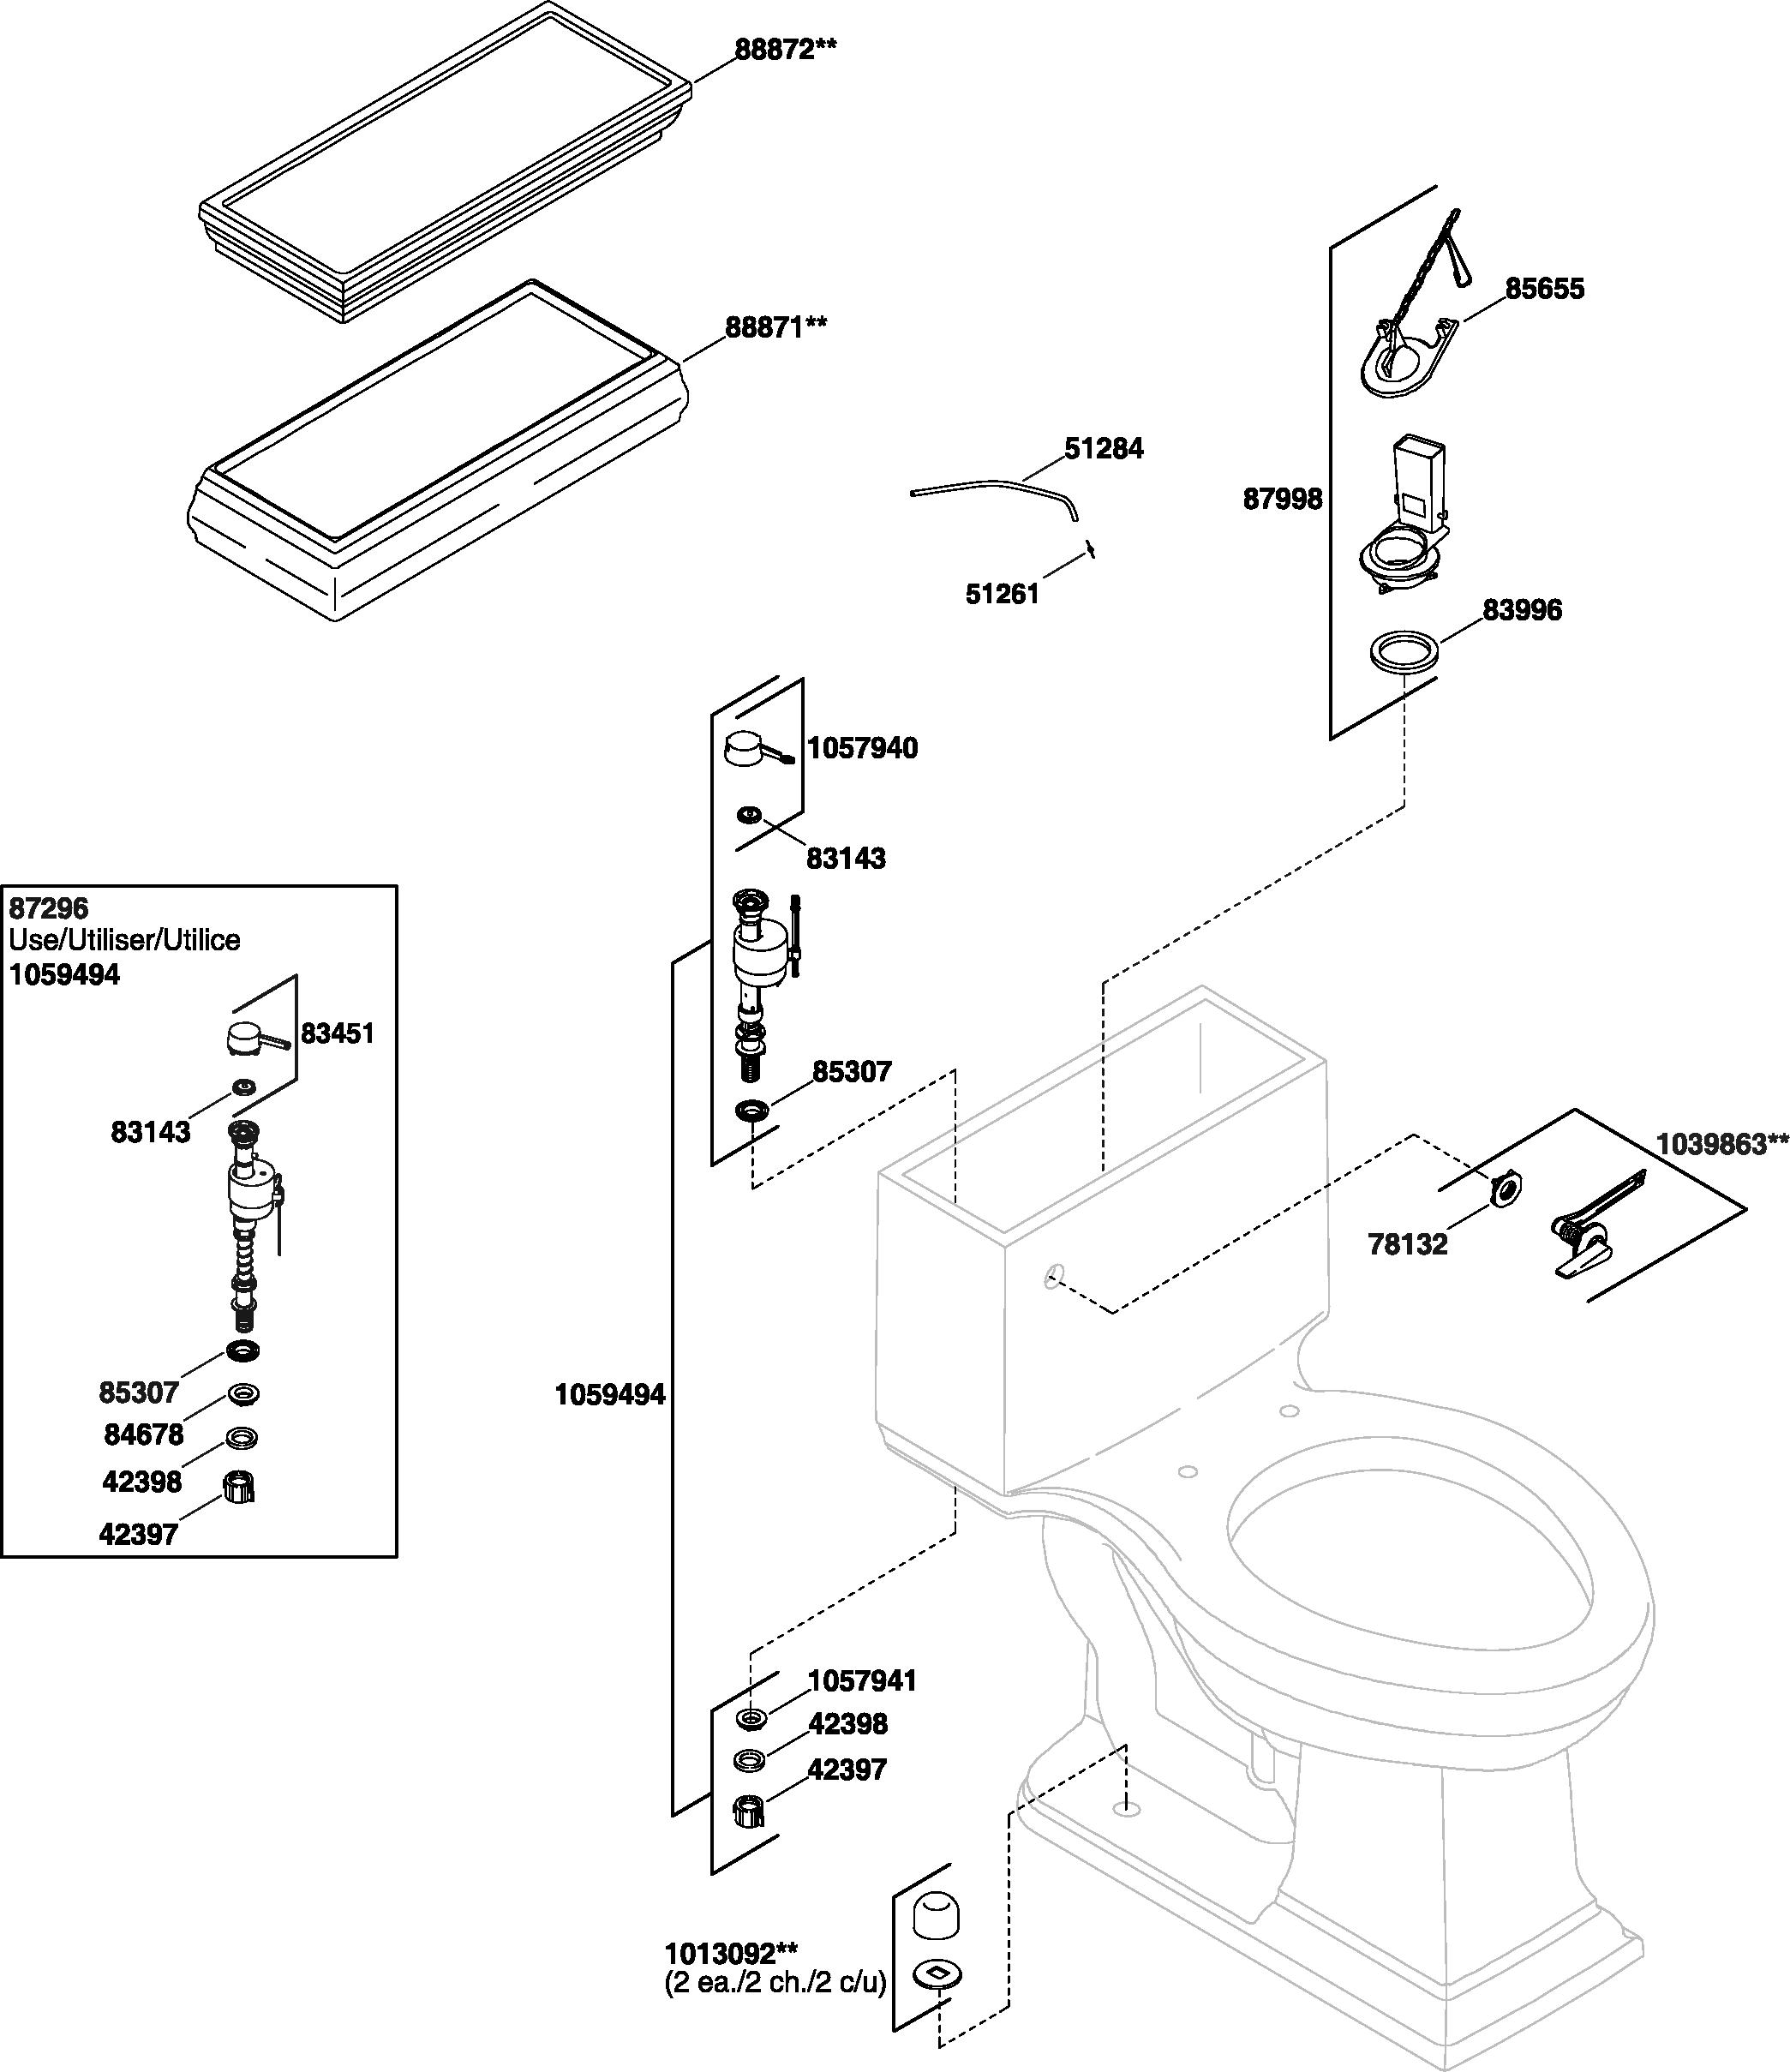 Kohler K 3453 Memoirs Toilet Parts